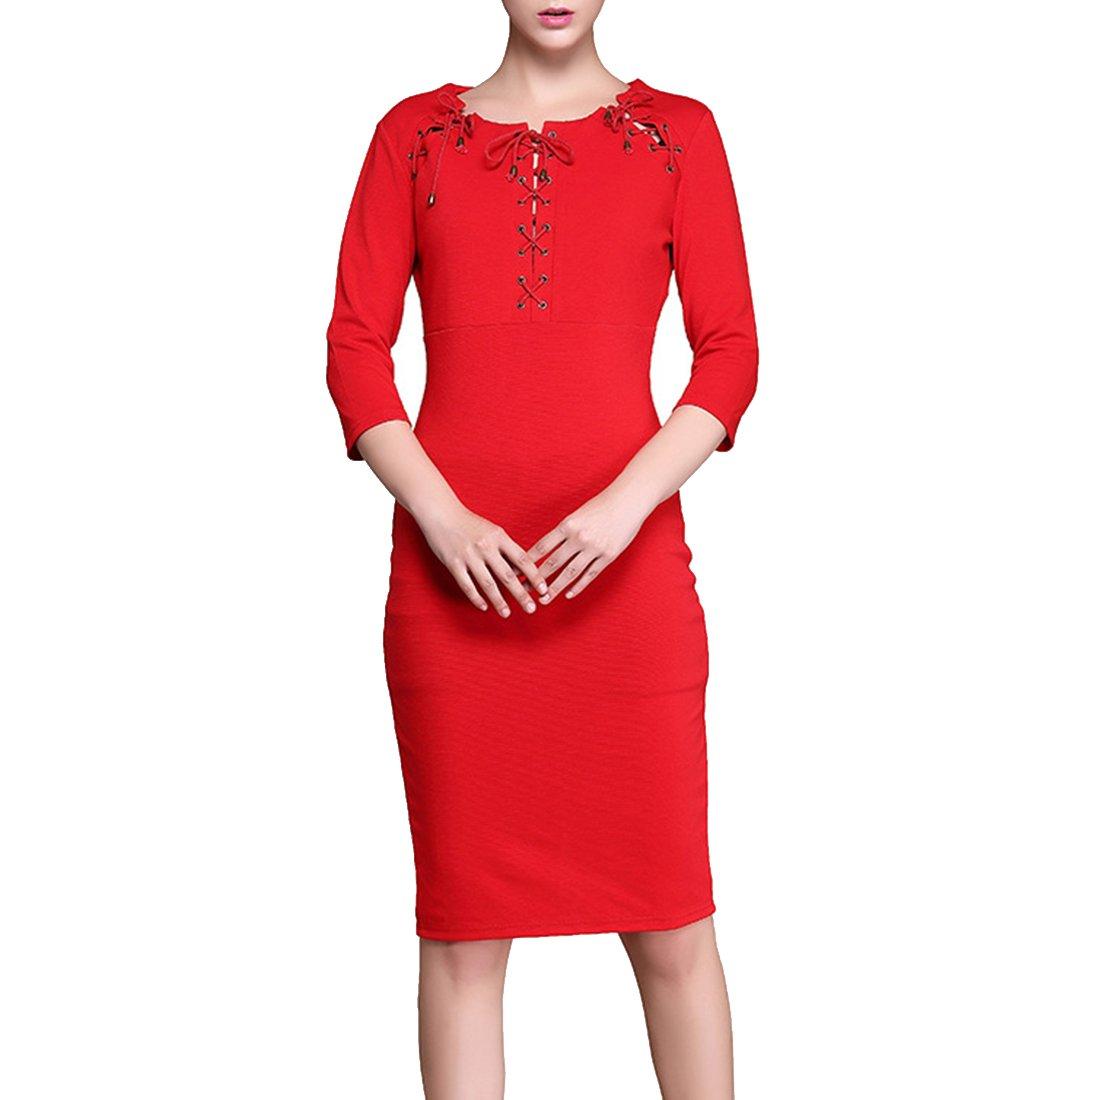 YOKIRIN Falda Roja Lápiz Negra Media Larga de Otoño para Mujer 3/4 ...